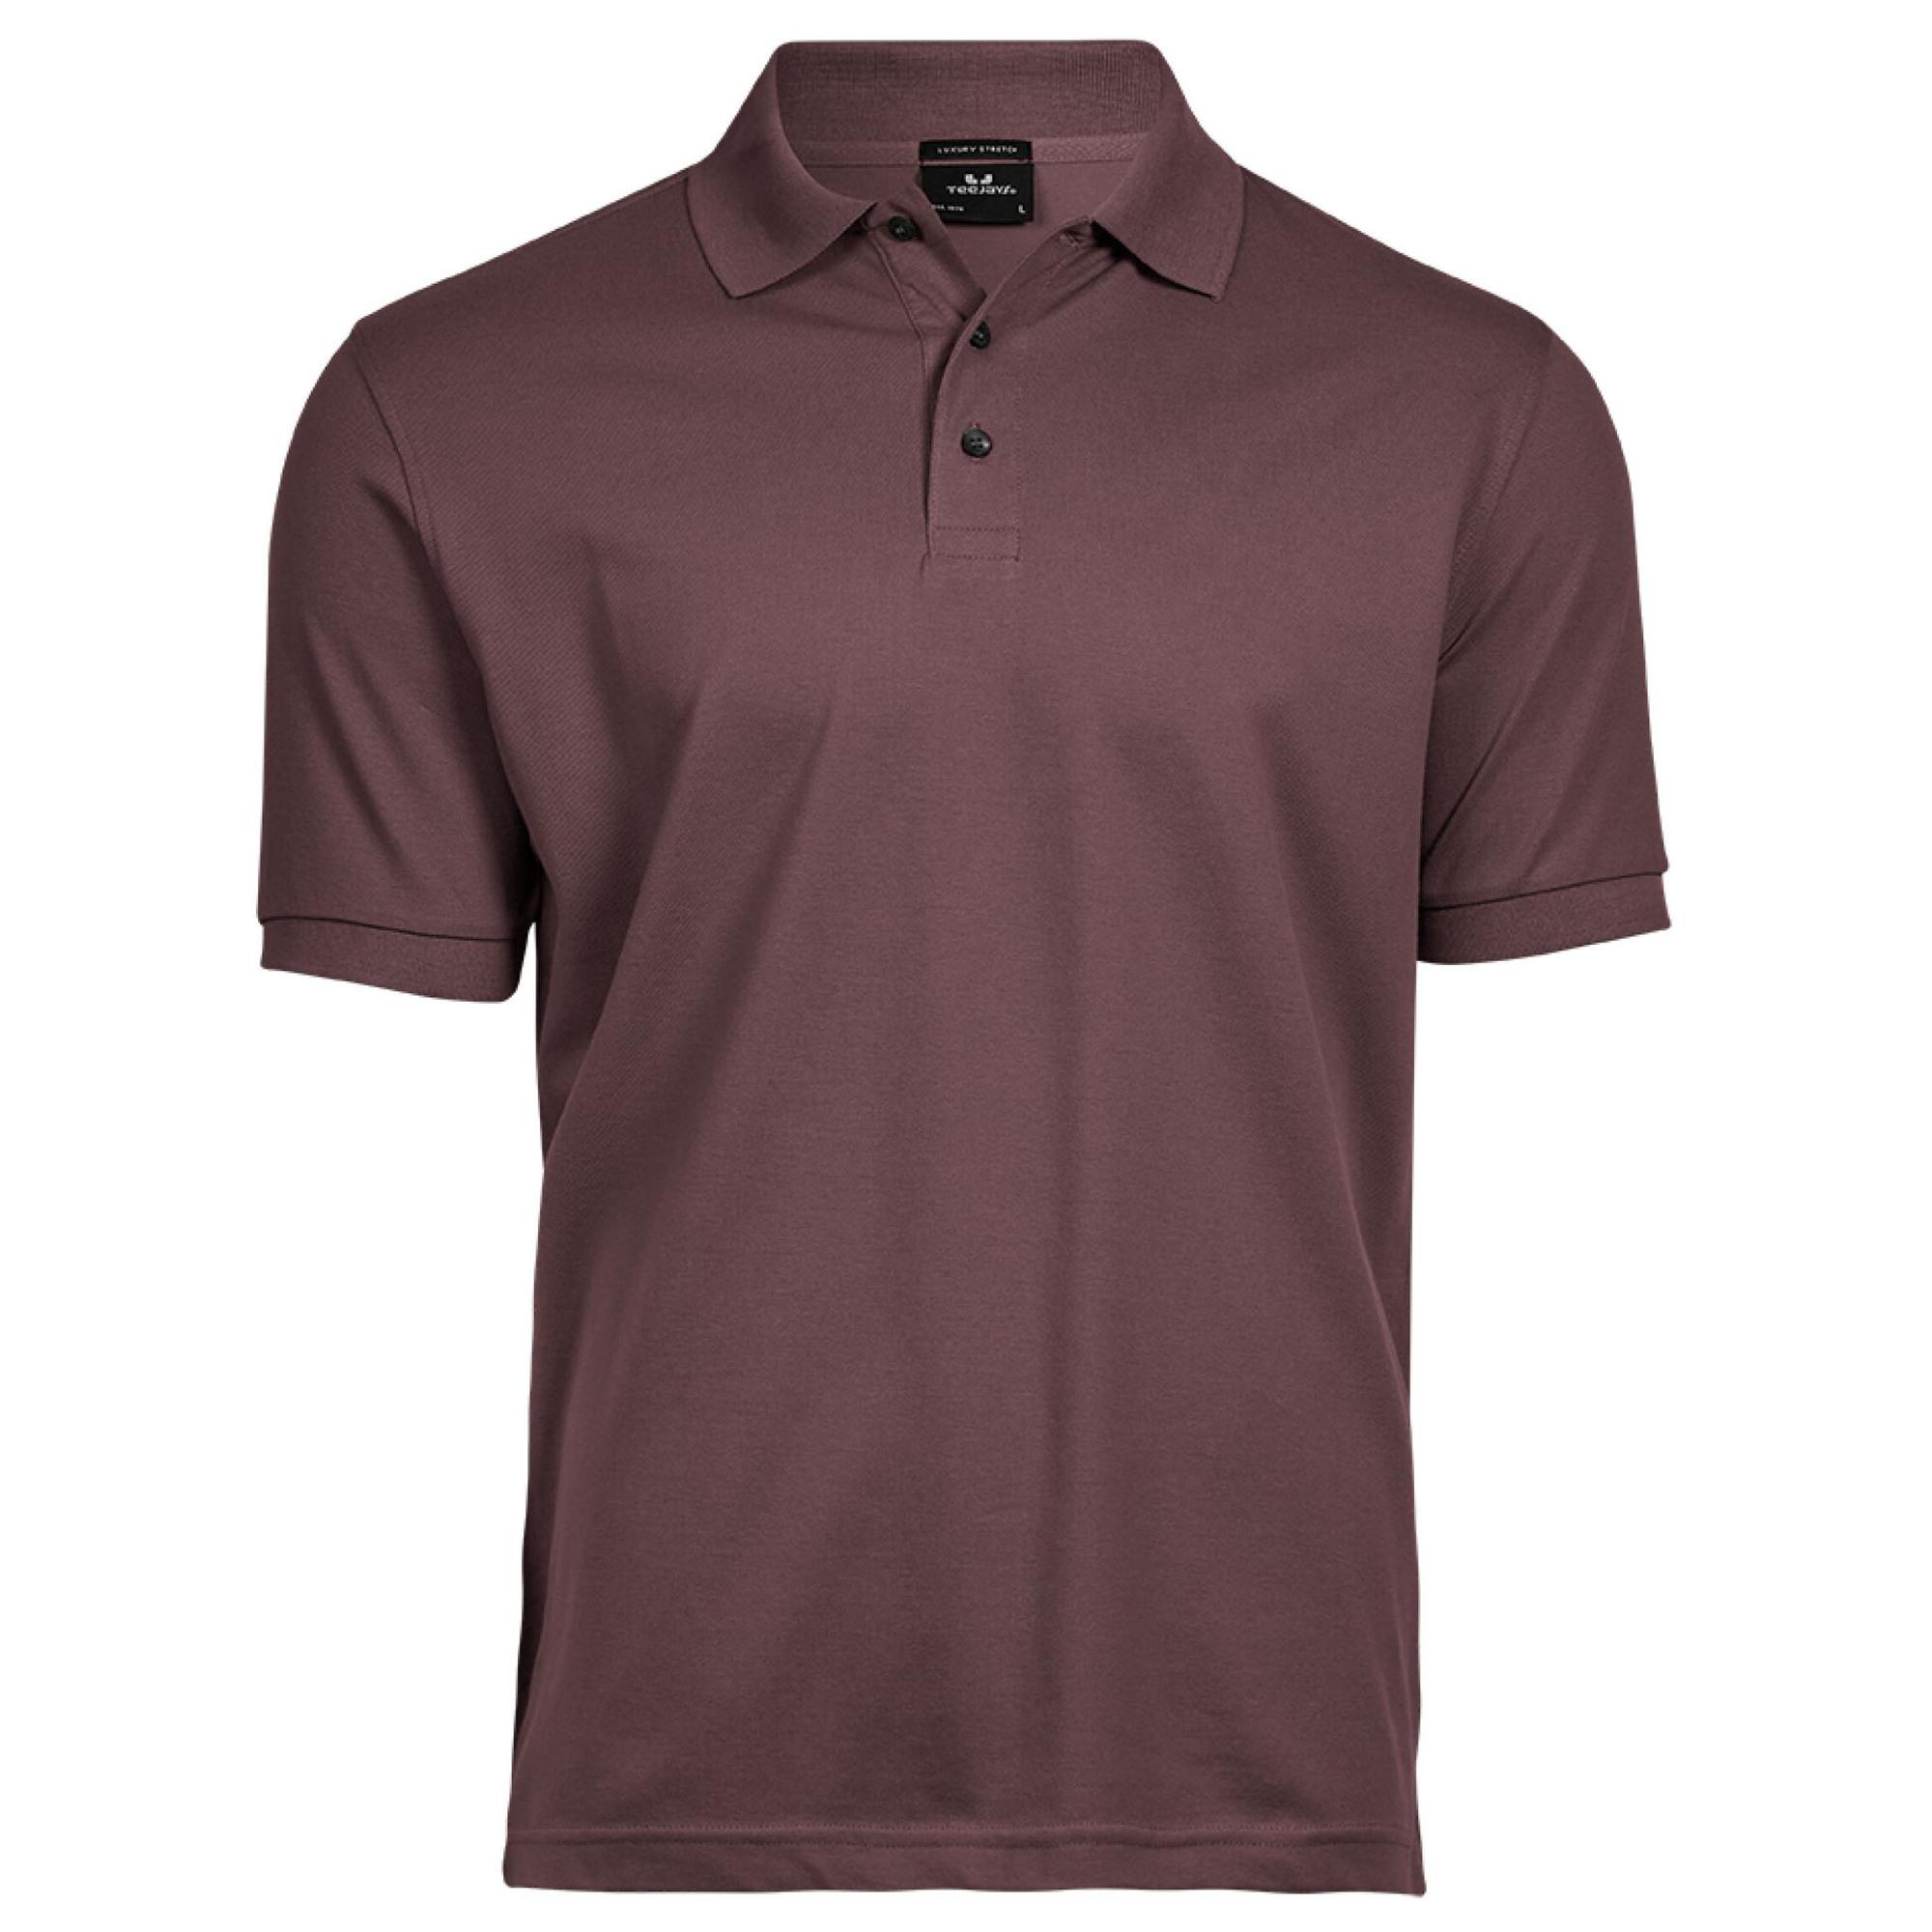 Tee jays mens luxury stretch short sleeve polo shirt ebay for Stretch polo shirt mens